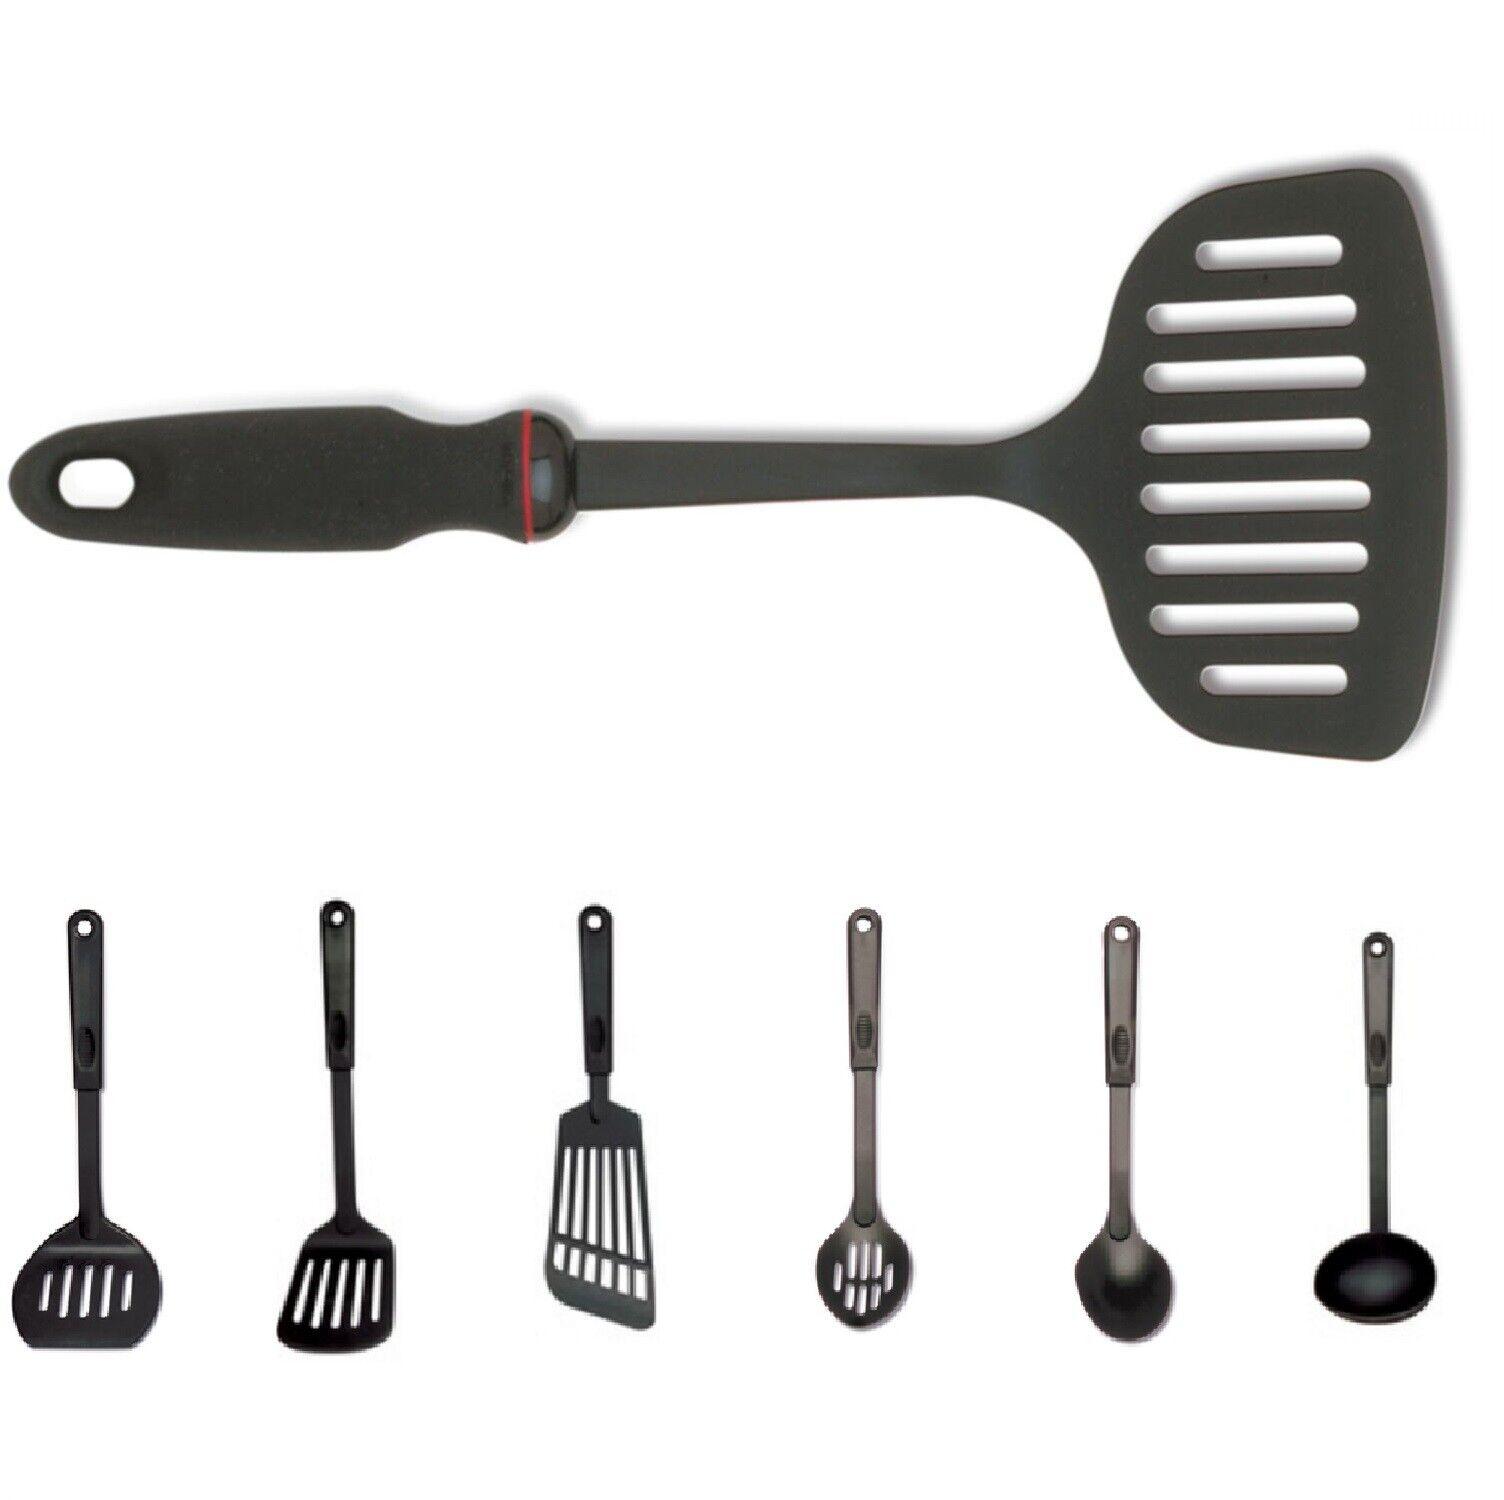 Black Nylon Heat Proof Kitchen Easy Grip Cooking Utensil Set